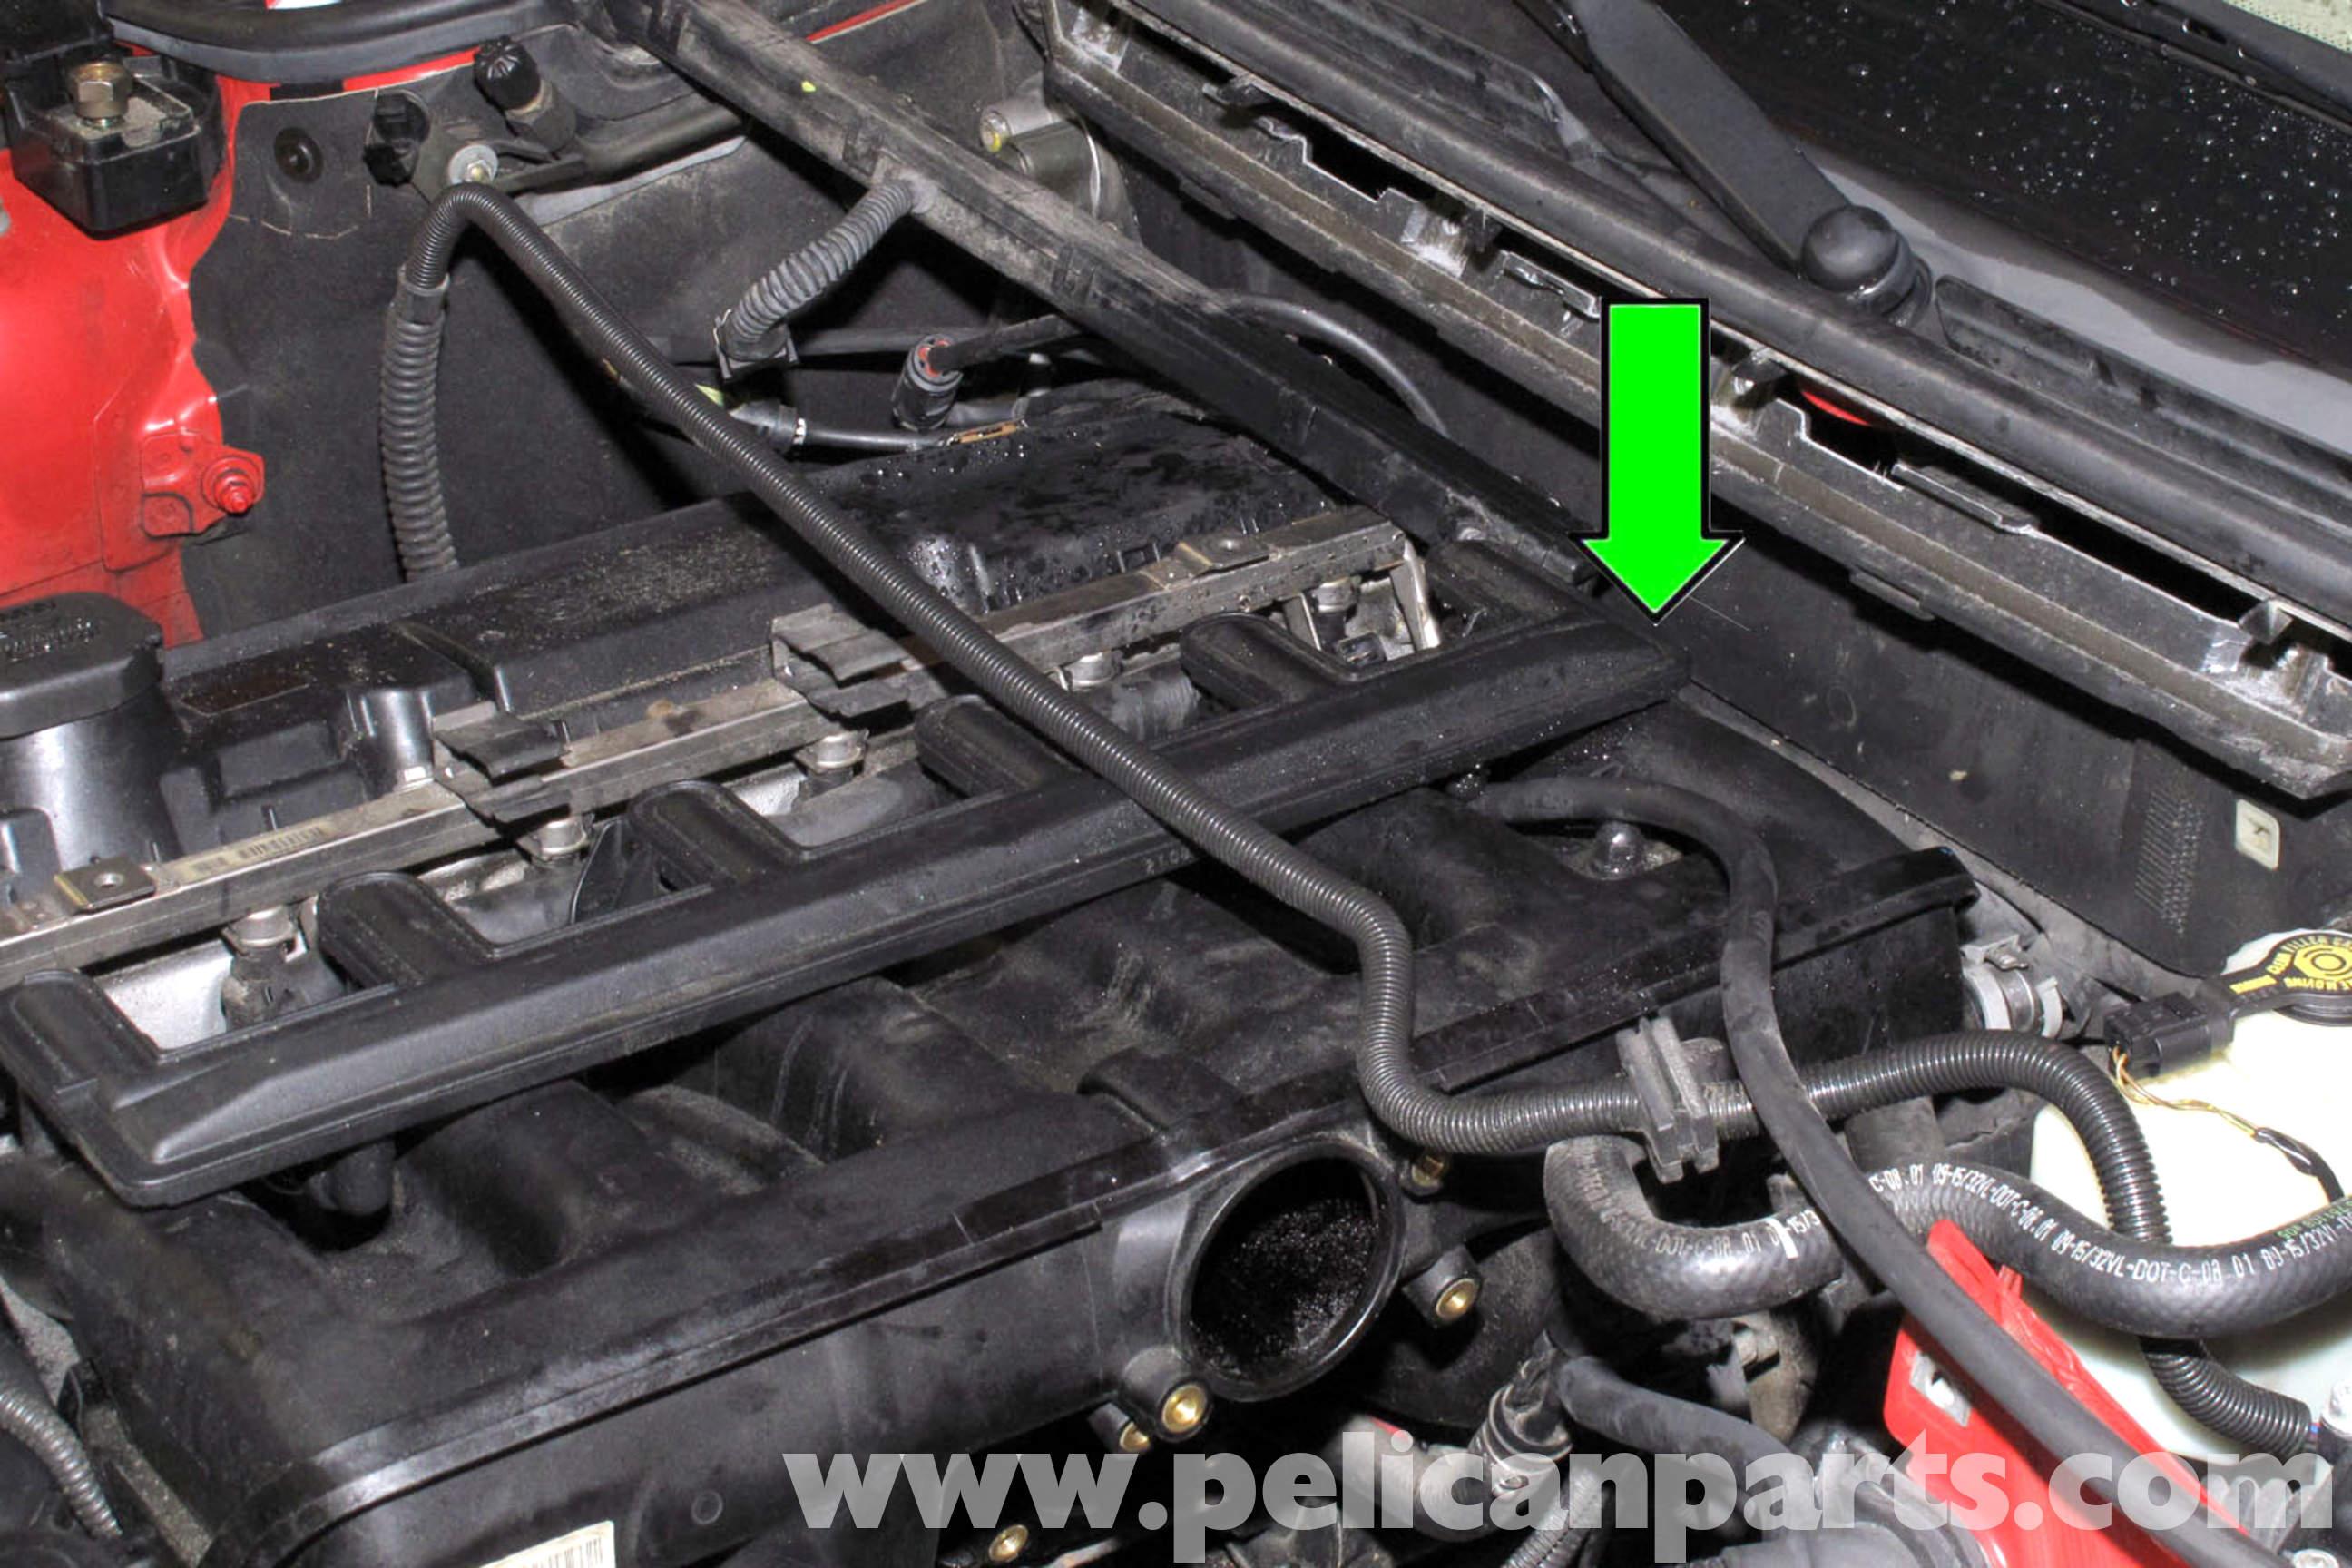 BMW Z3 Fuel Injector Replacement | 1996-2002 | Pelican Parts DIY  Maintenance ArticlePelican Parts